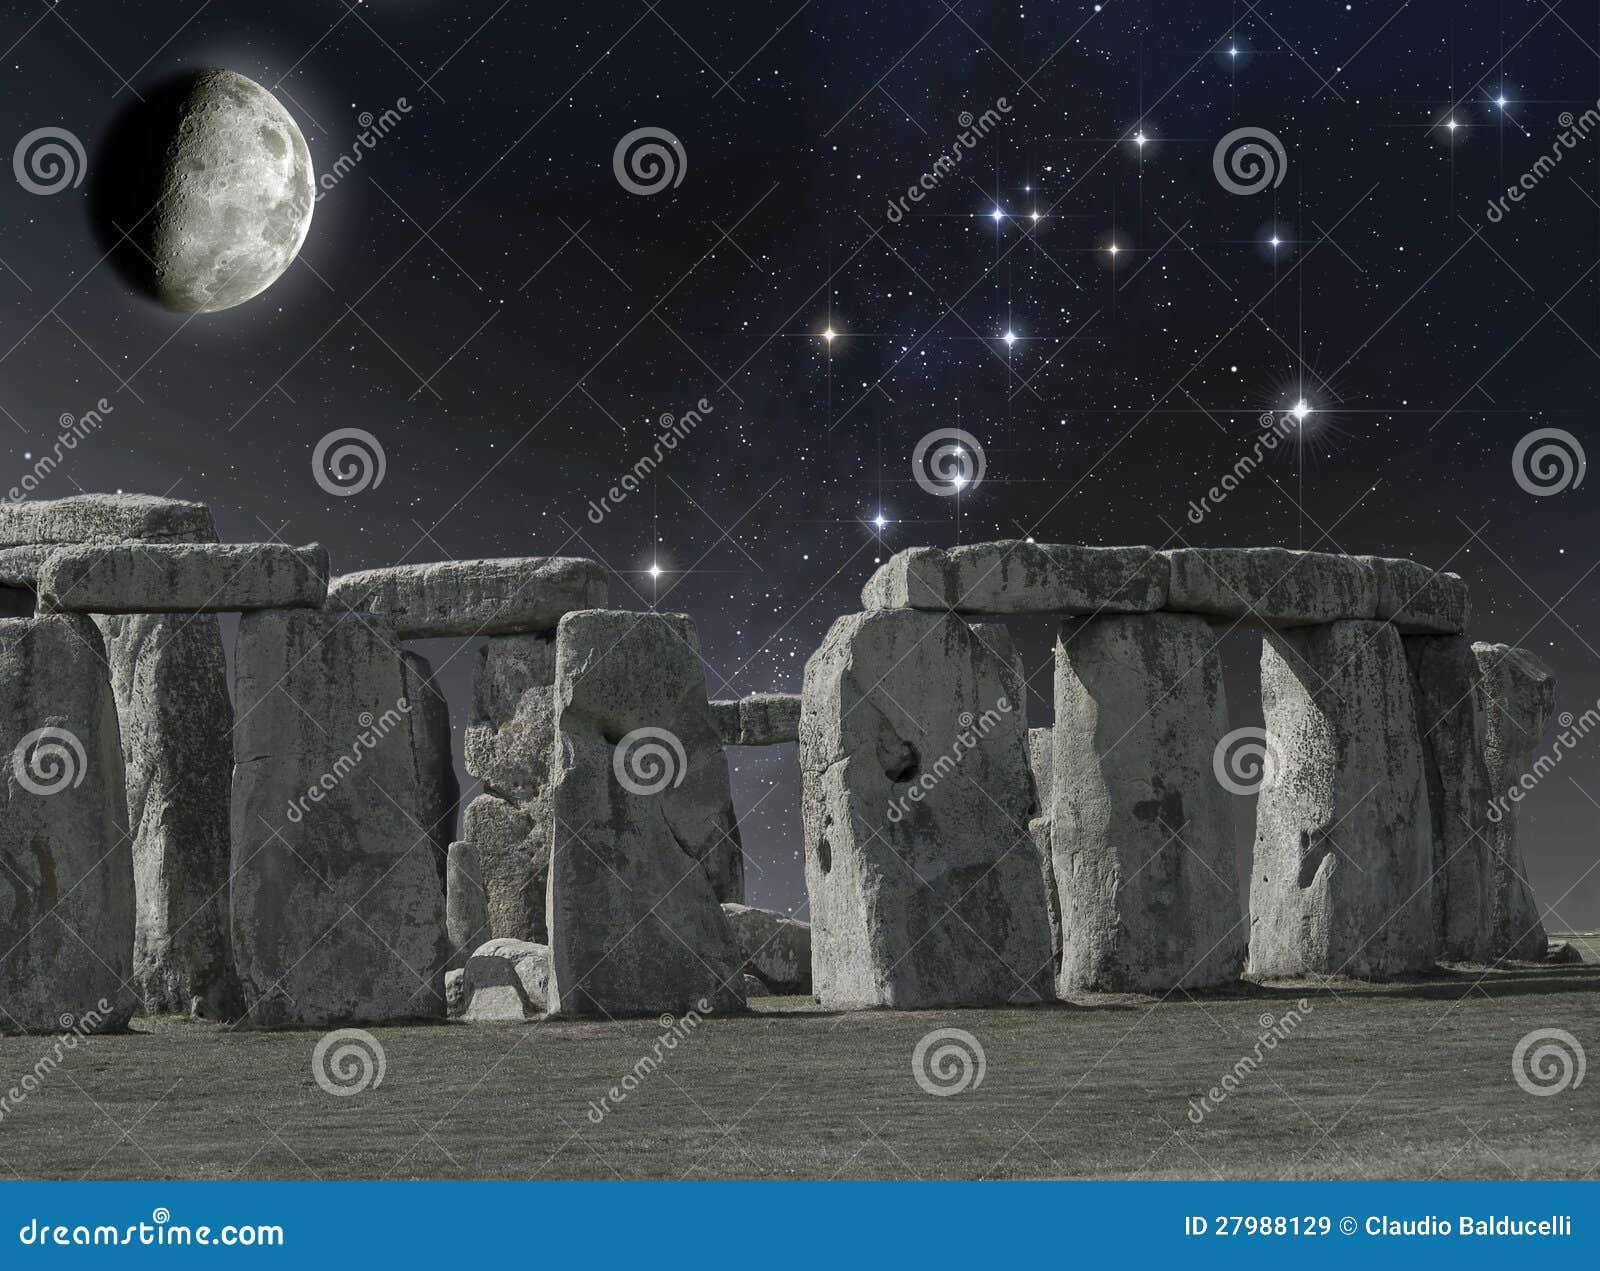 stonehenge moonlight - HD1300×1049